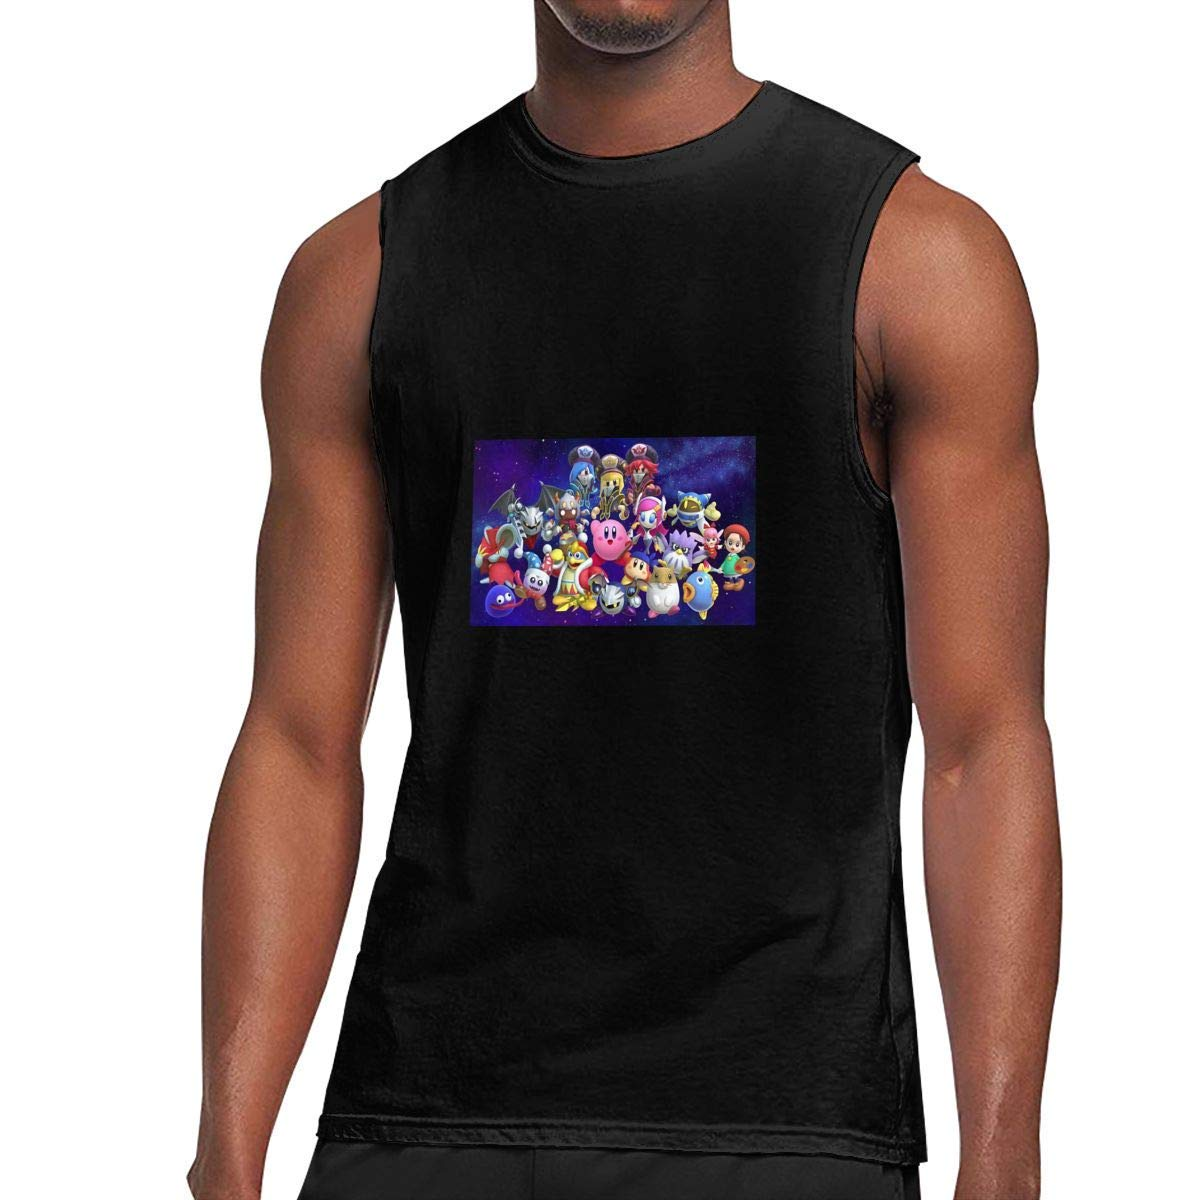 S Sleeveless T Shirts Kirby Workout Tank Tops Gym Bodybuilding Tshirts Black